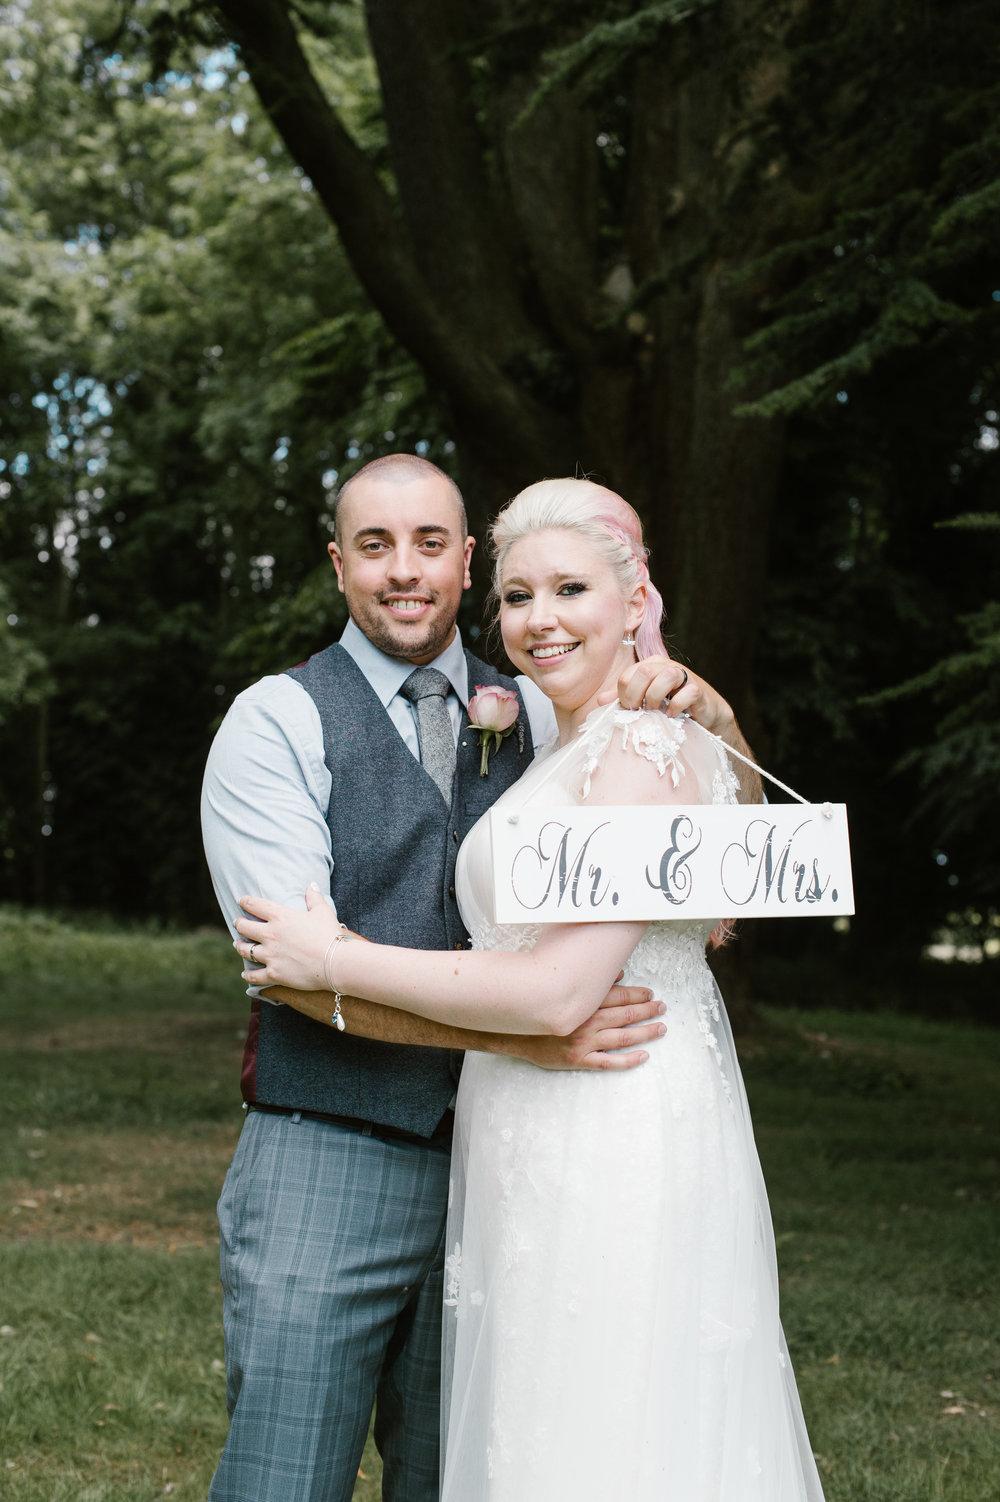 Lauren and Thomas Wedding - 17.06.2017-1569.JPG